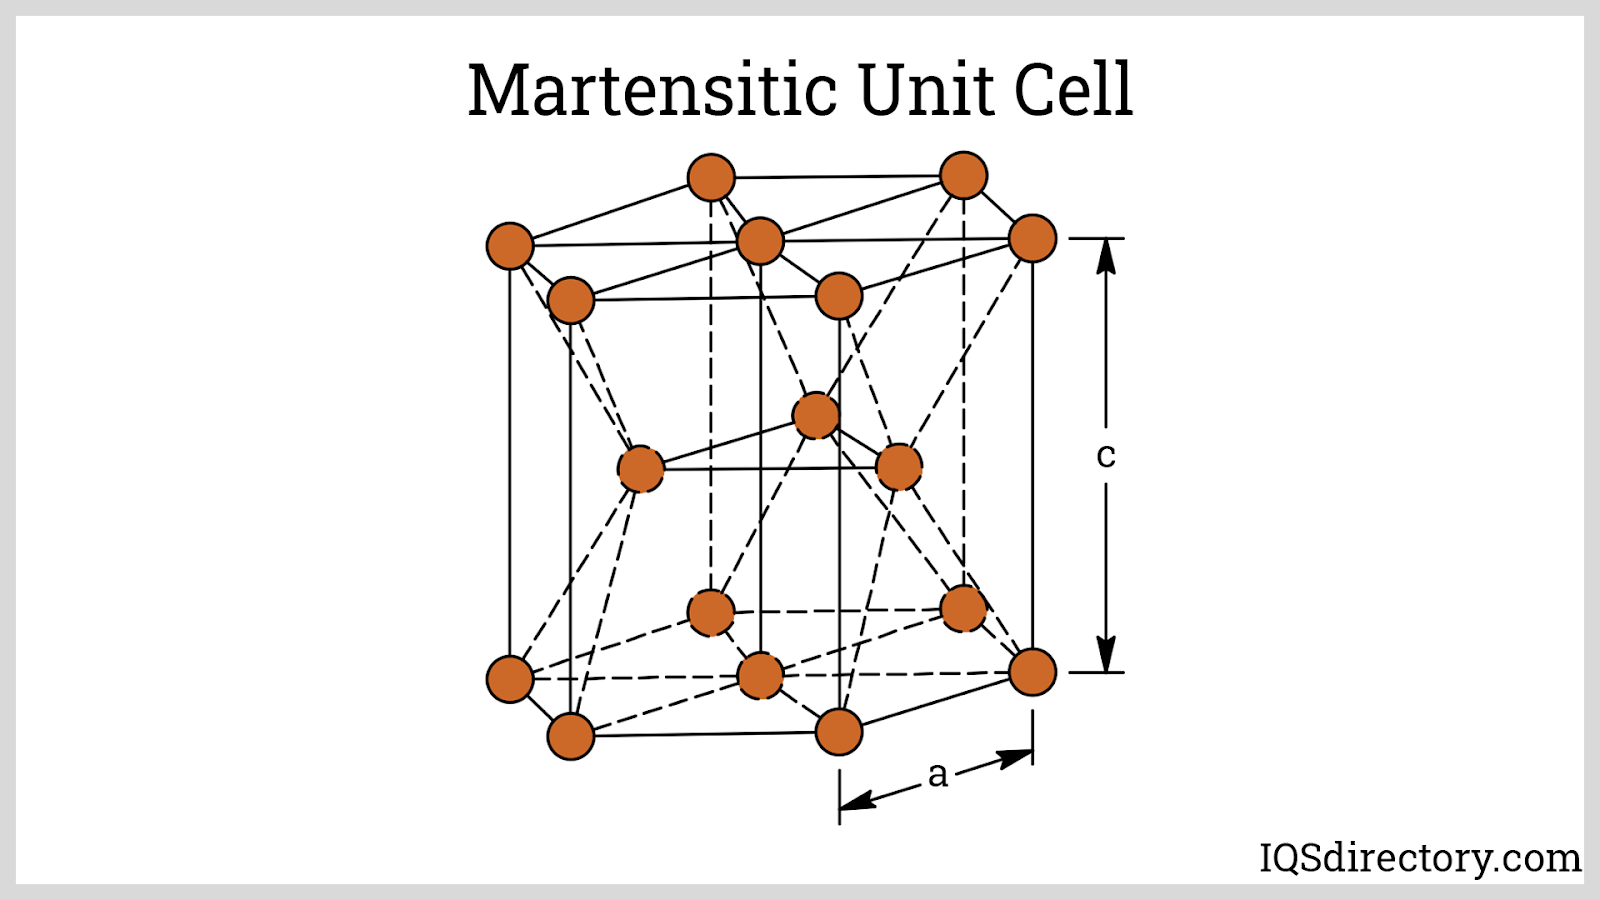 Martensitic Unit Cell